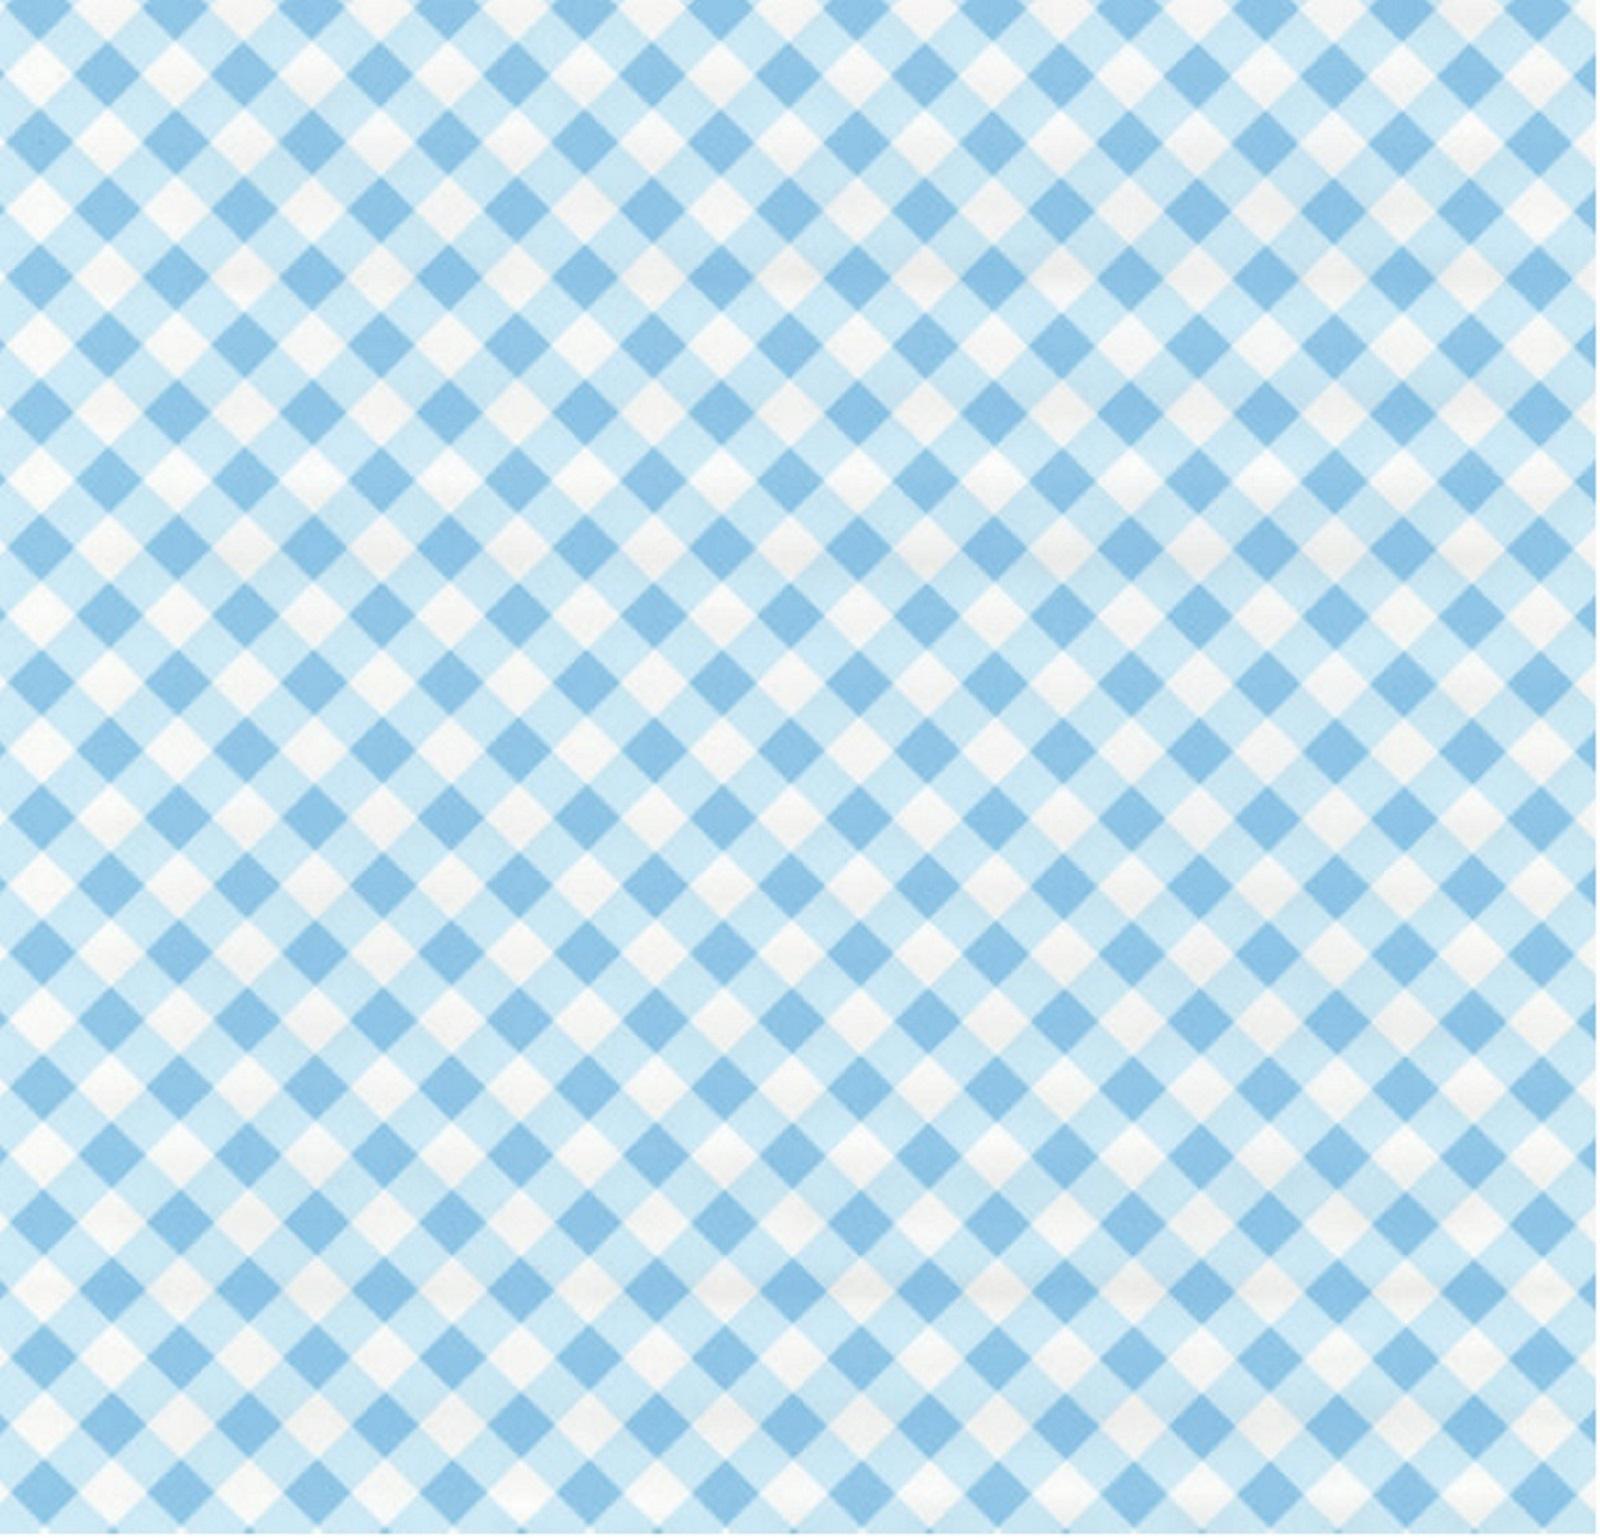 klebefolie m belfolie diagonal blau 45 x 200 cm dekorfolie klebefolie mit muster. Black Bedroom Furniture Sets. Home Design Ideas